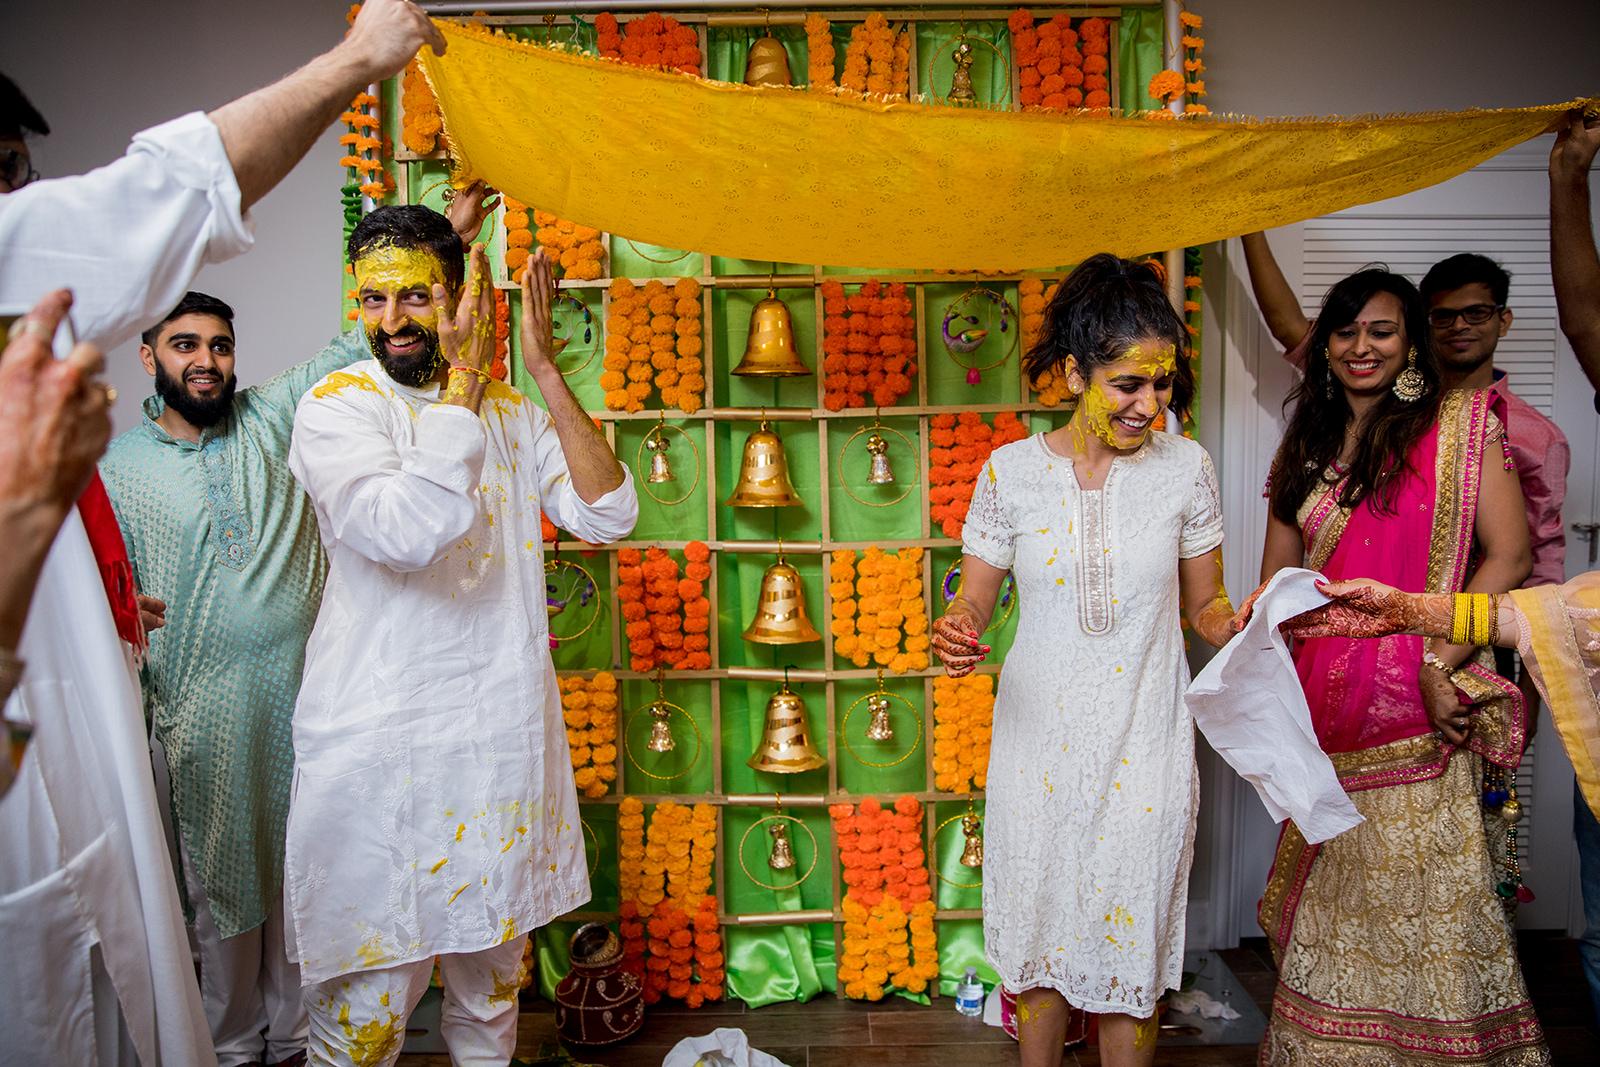 Le Cape Weddings - Sumeet and Chavi - Pithi-48.jpg